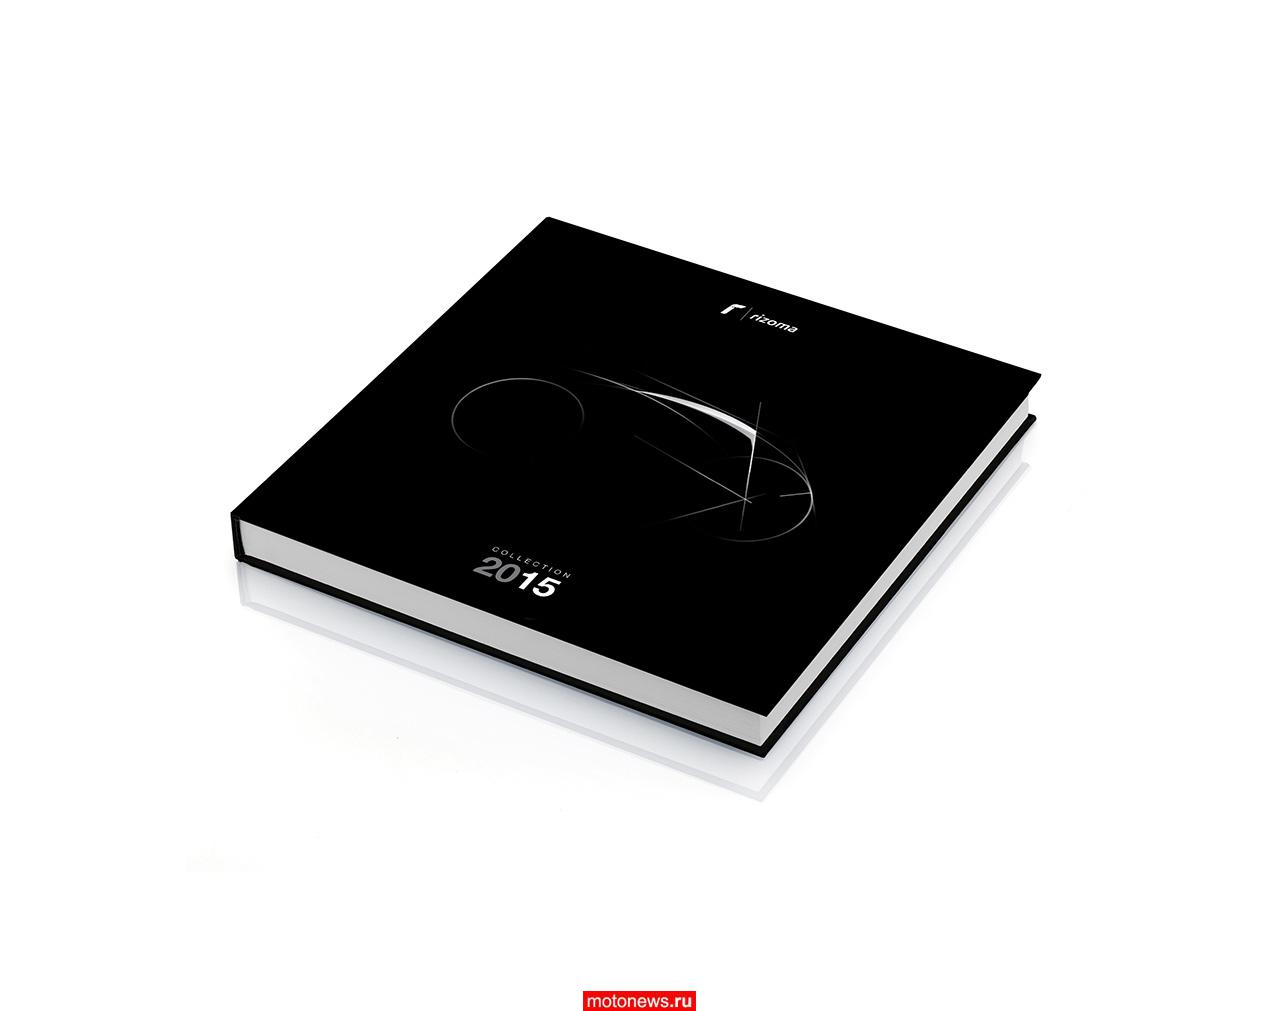 Rizoma представила новый каталог тюнинга 2015